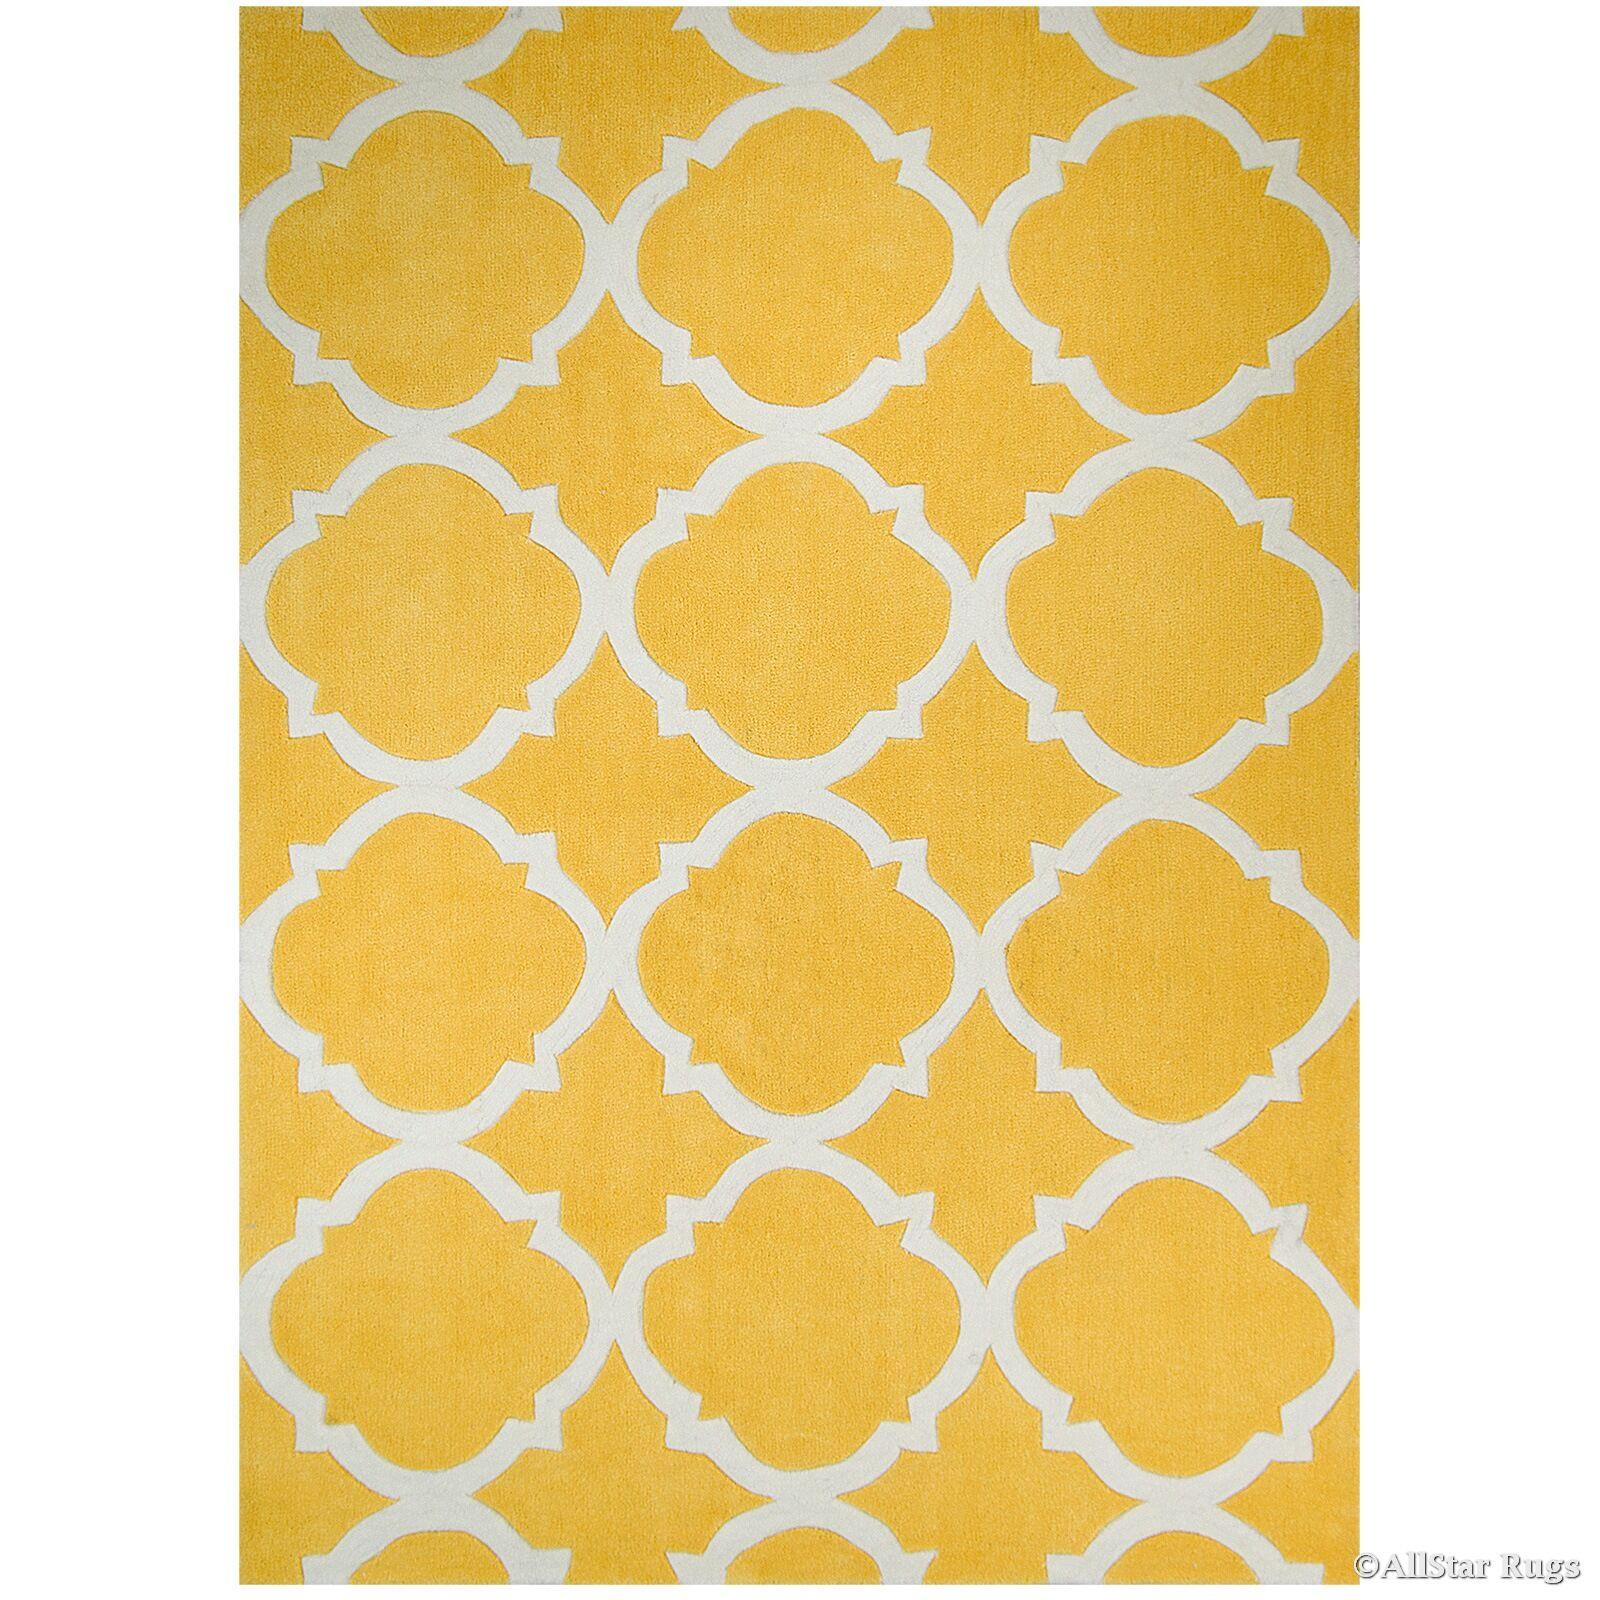 Handmade Yellow Area Rug Rug Size: 4'11